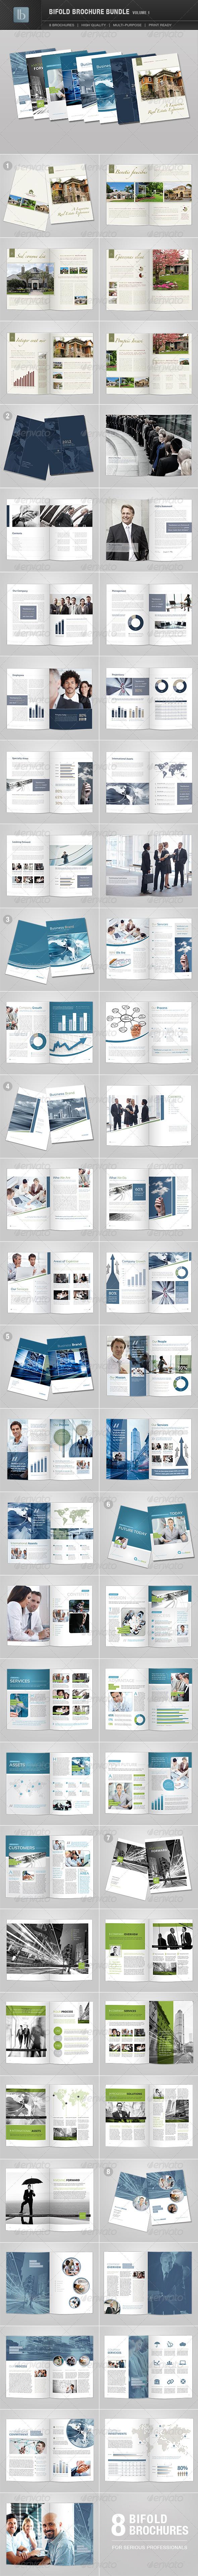 GraphicRiver Bifold Brochure Bundle Volume 1 2653901